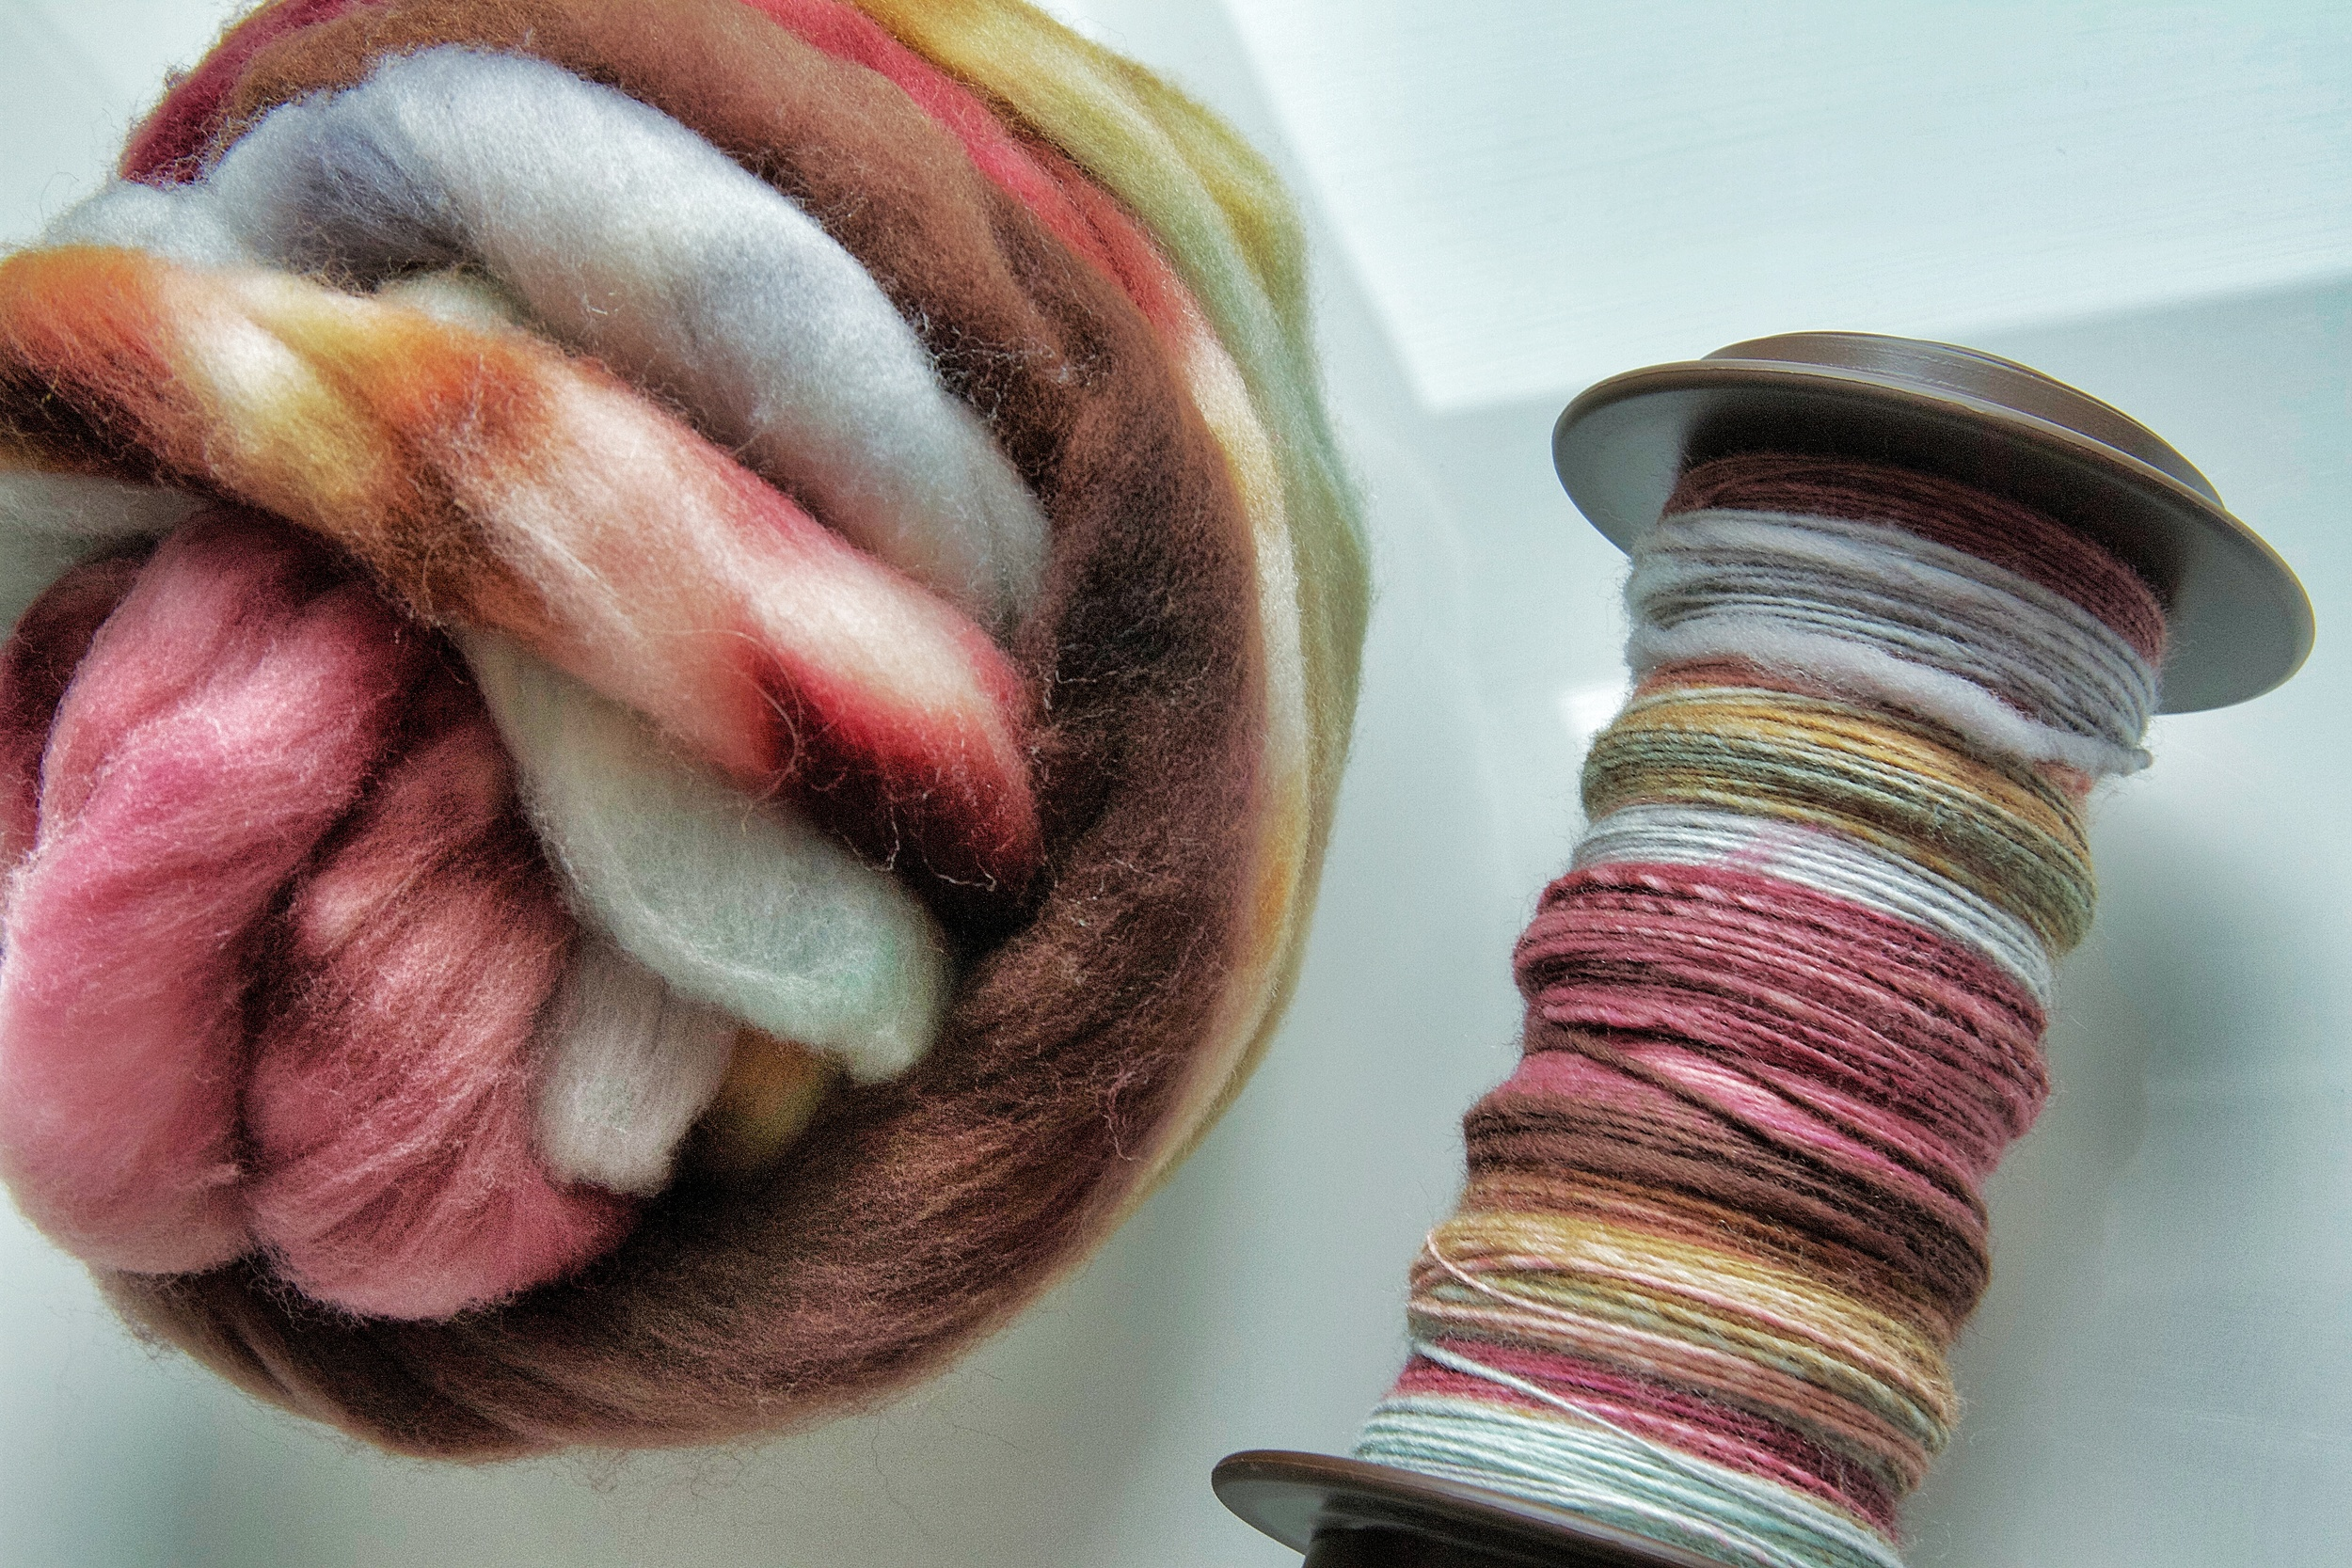 Hello Yarn  spinning fiber in Pate de Fruit colourway (November 2011 in the Hello Yarn Fiber Club). Rambouillet wool top. 4oz.